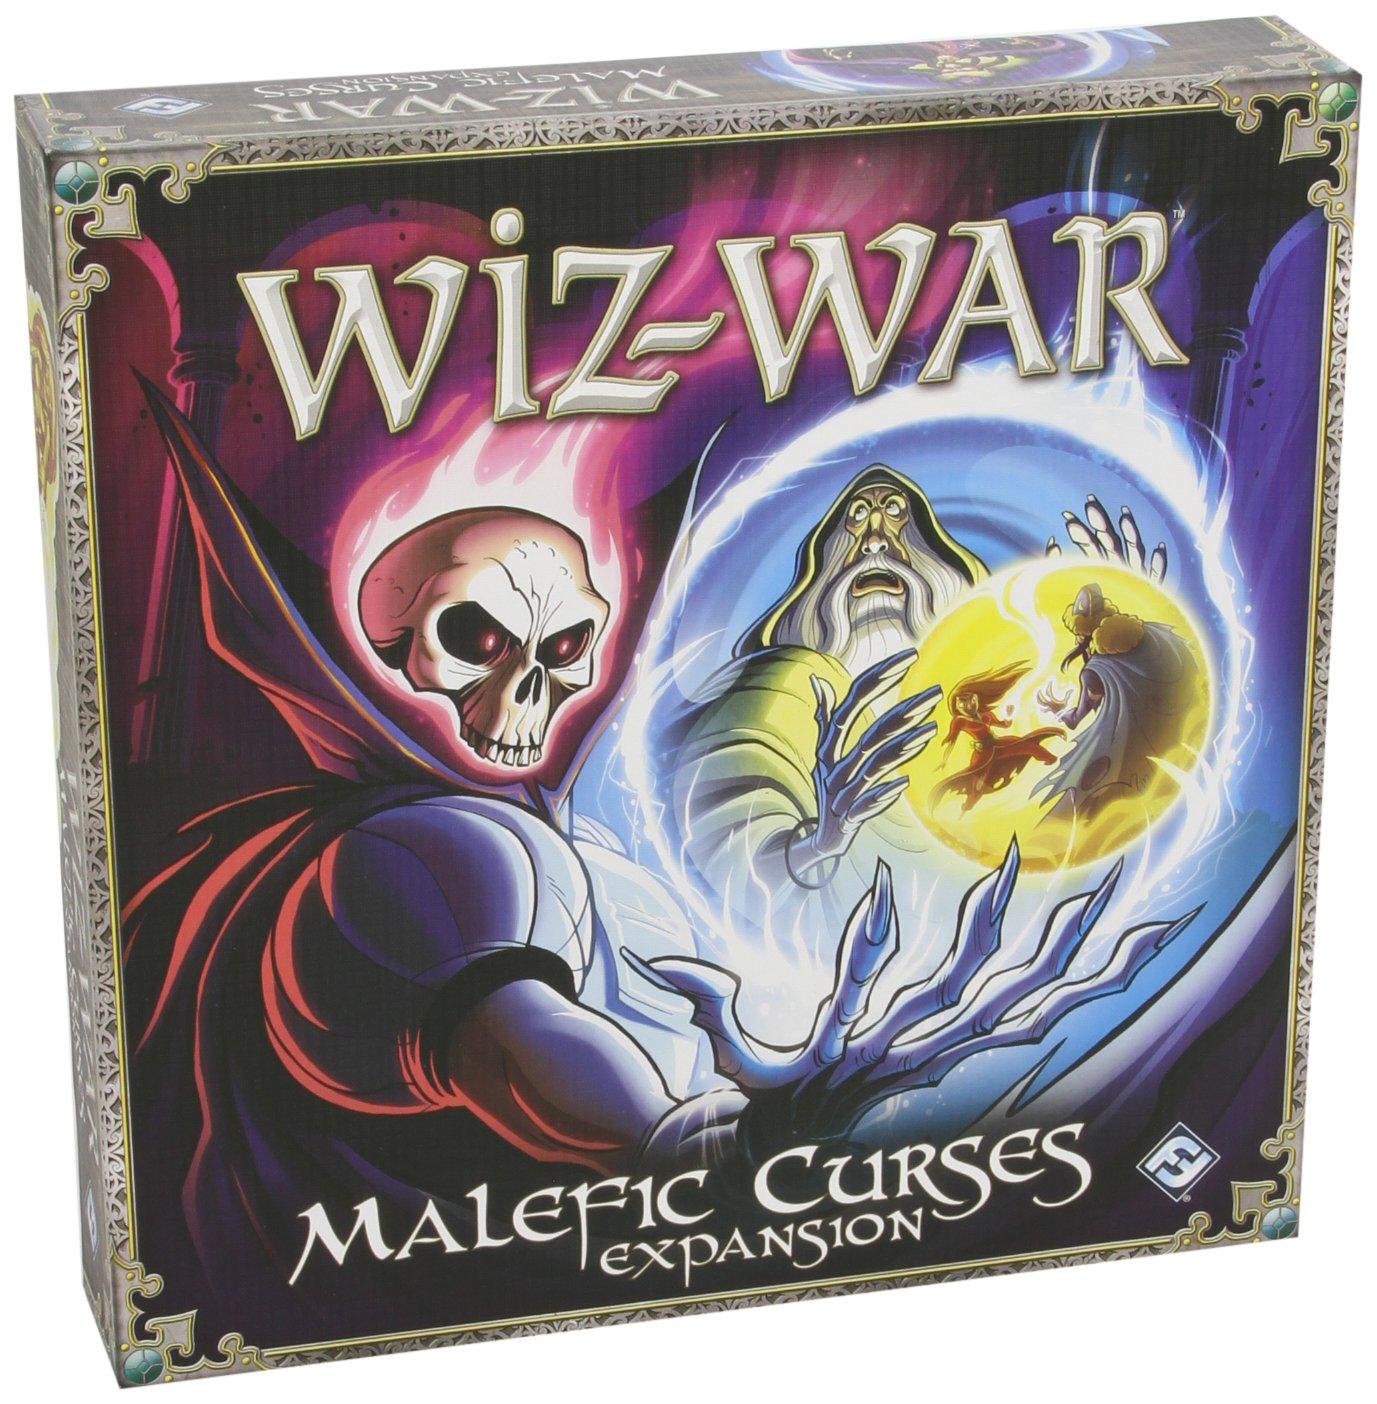 Wiz-War: Malefic Curses Expansion